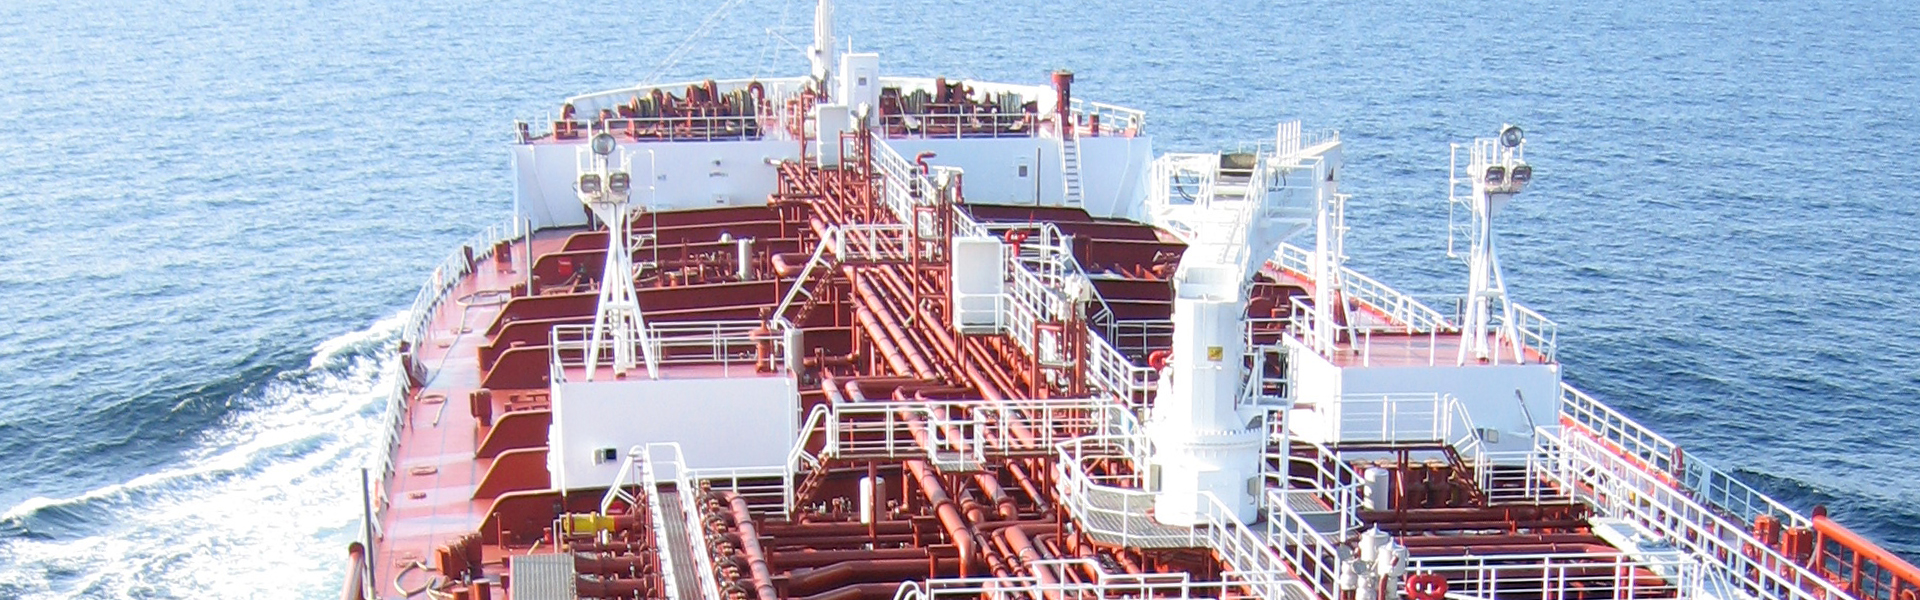 Cargo Pumping Systems Piping Diagram Ship